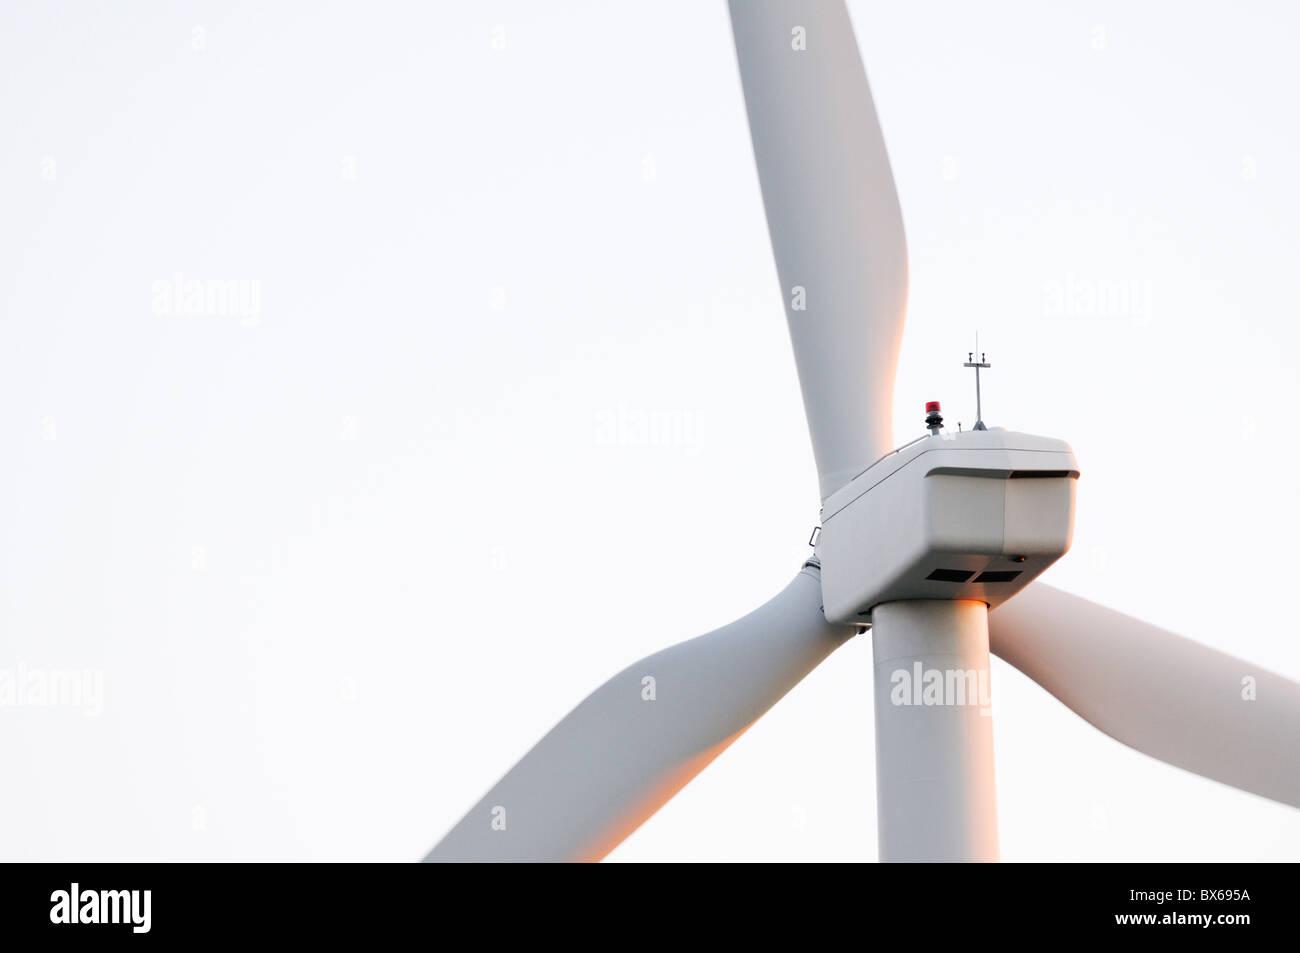 Wind turbine close-up Photo Stock